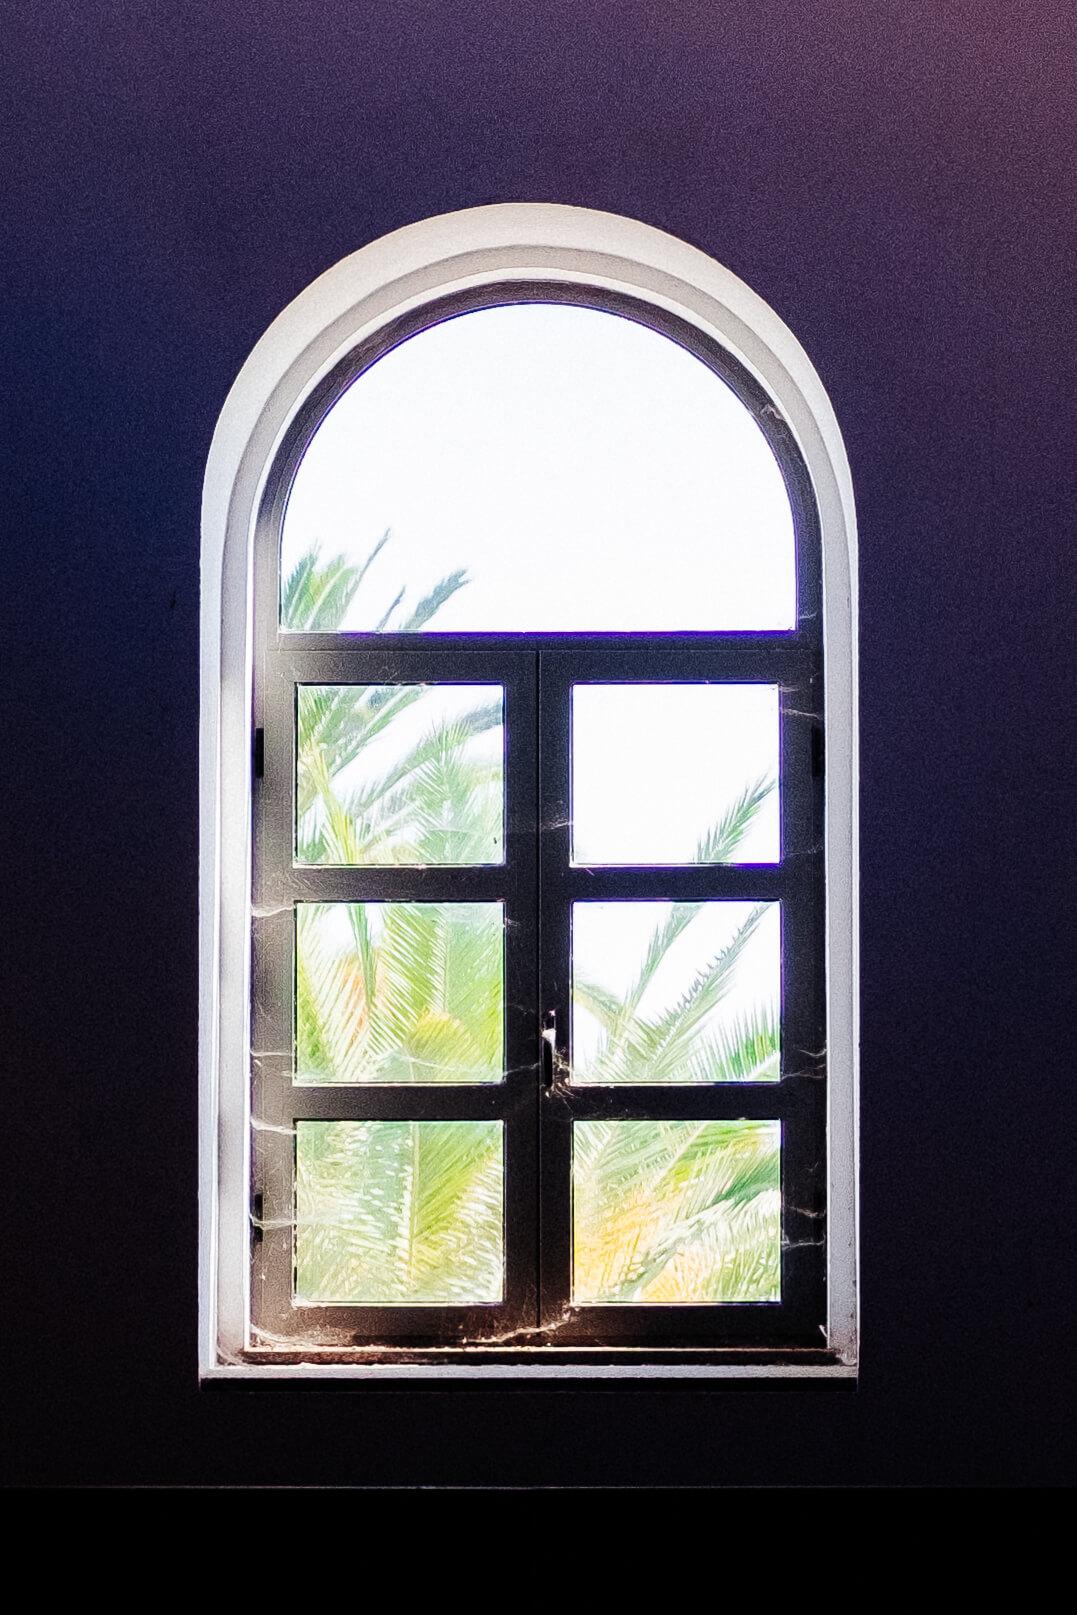 strangers-windows-lagos-portugal.jpg